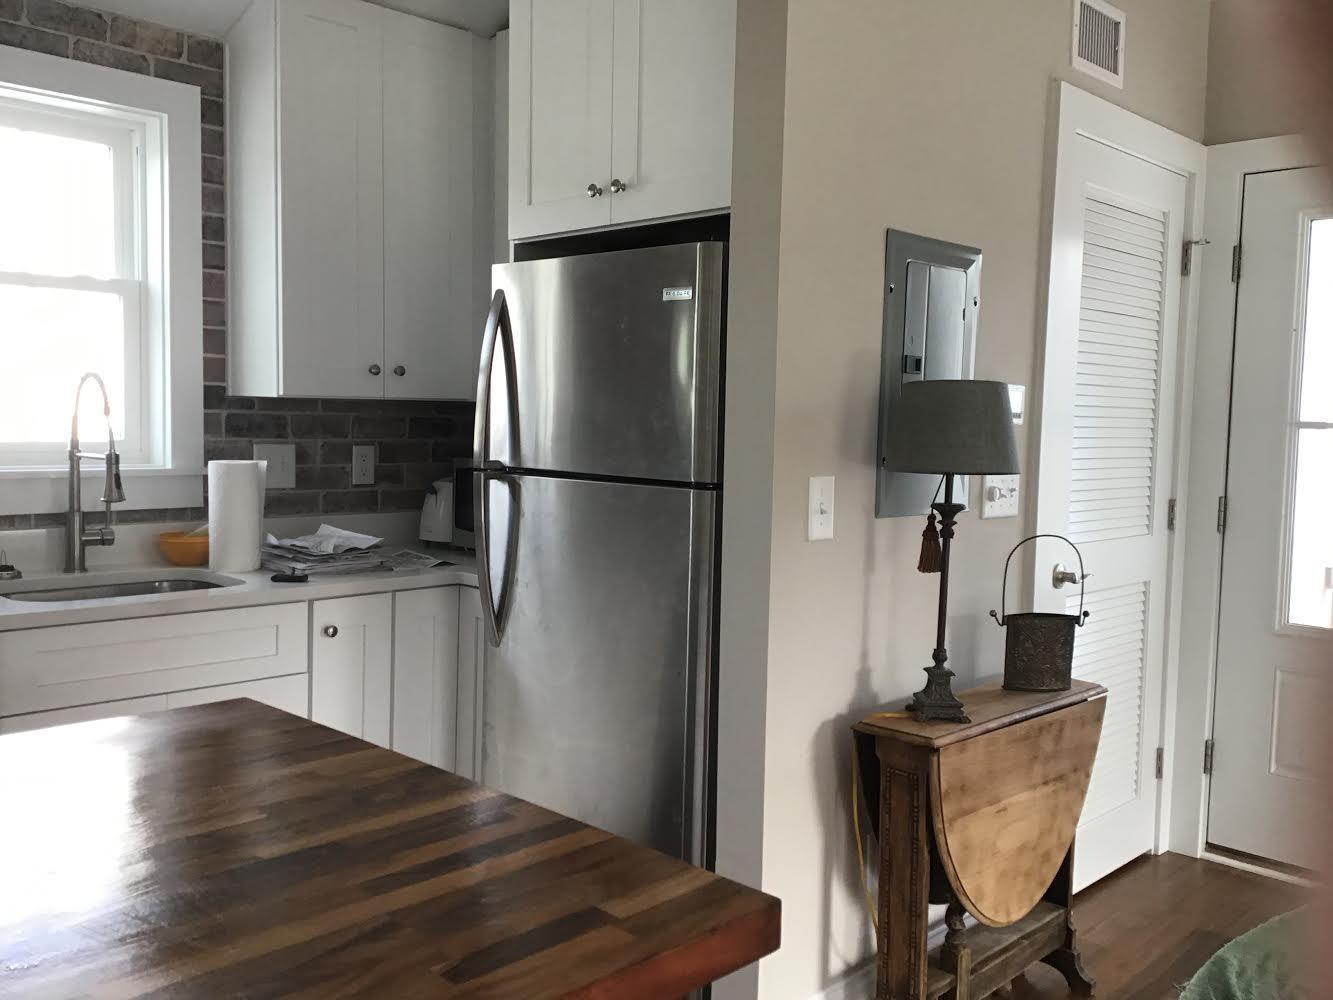 Old Mt Pleasant Homes For Sale - 542 Center, Mount Pleasant, SC - 0